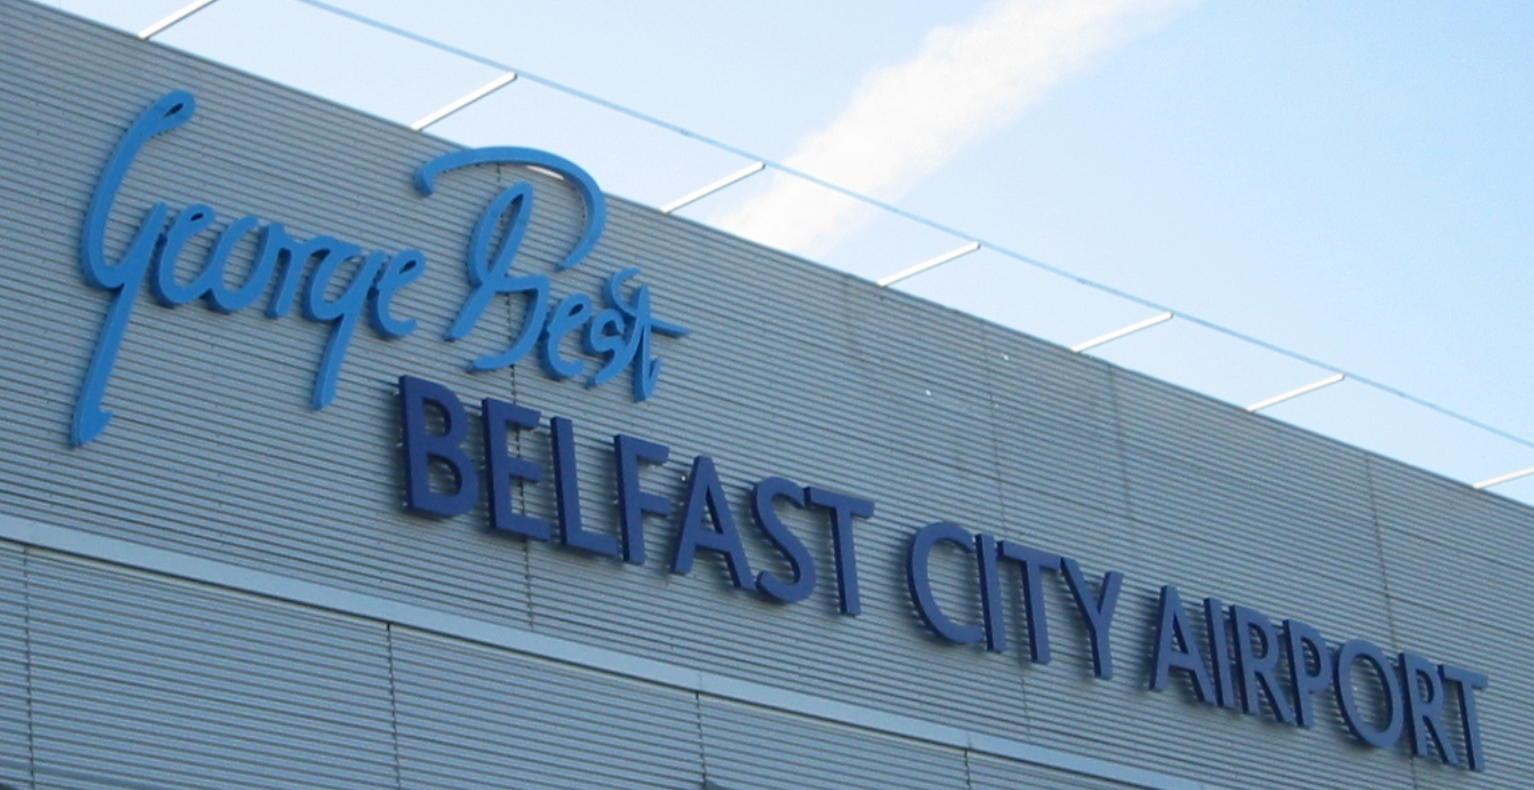 George Best Belfast Cityn lentoasema